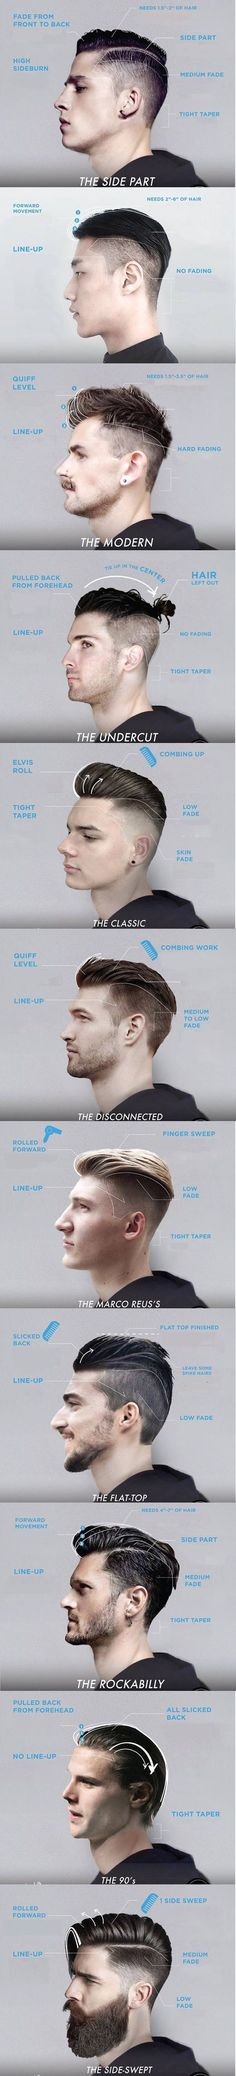 Fashionable Mens Haircuts. : Яндекс.Почта  бесплатная электронная почта